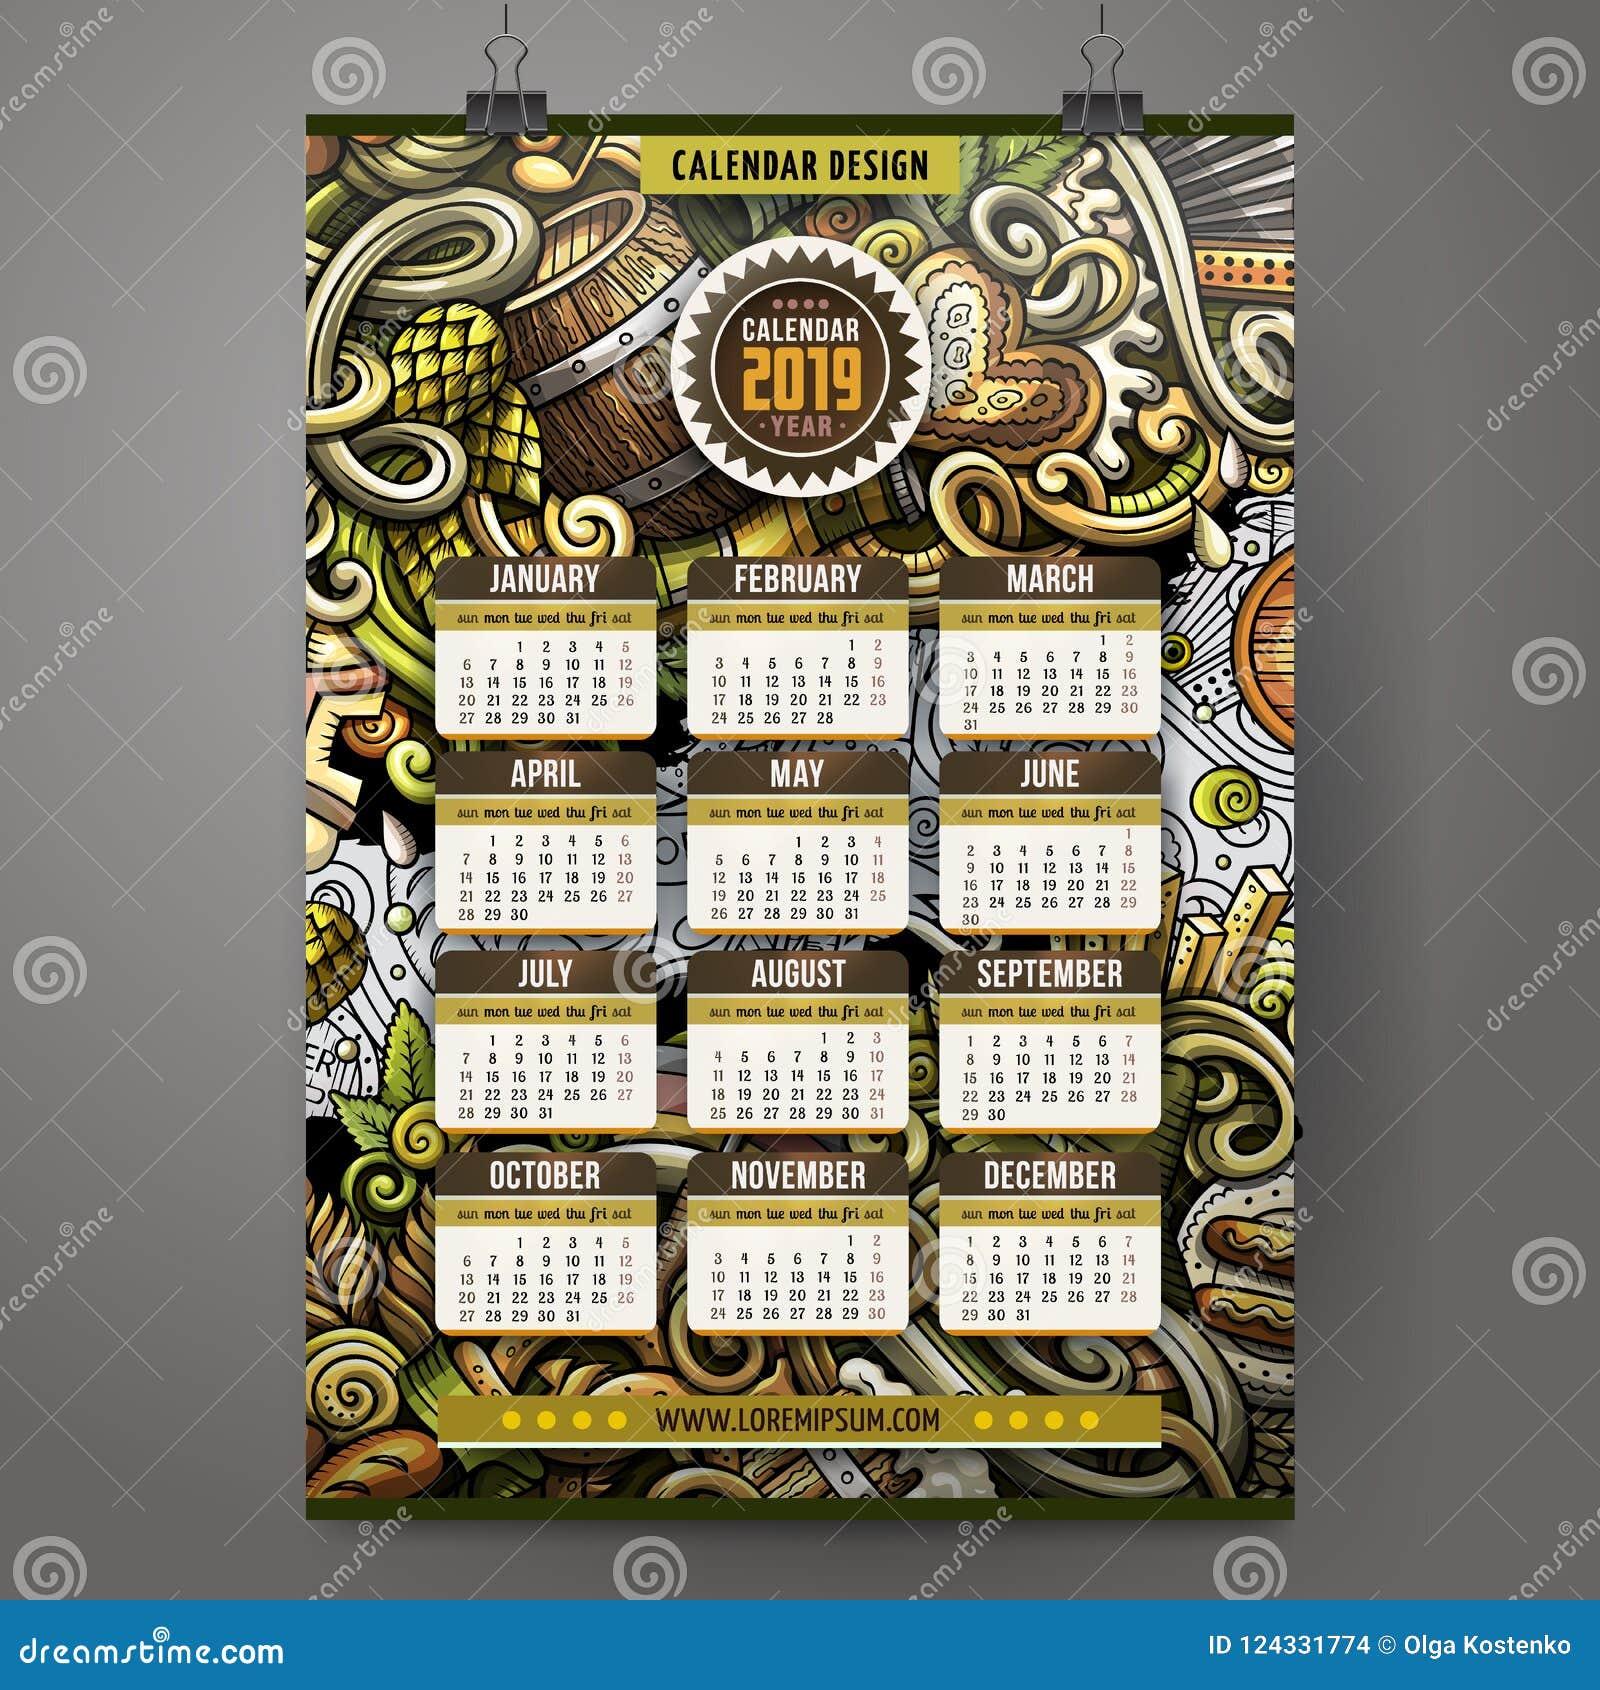 Beer Festival Calendar 2019 Cartoon Doodles Beer Fest 2019 Year Calendar Template. English